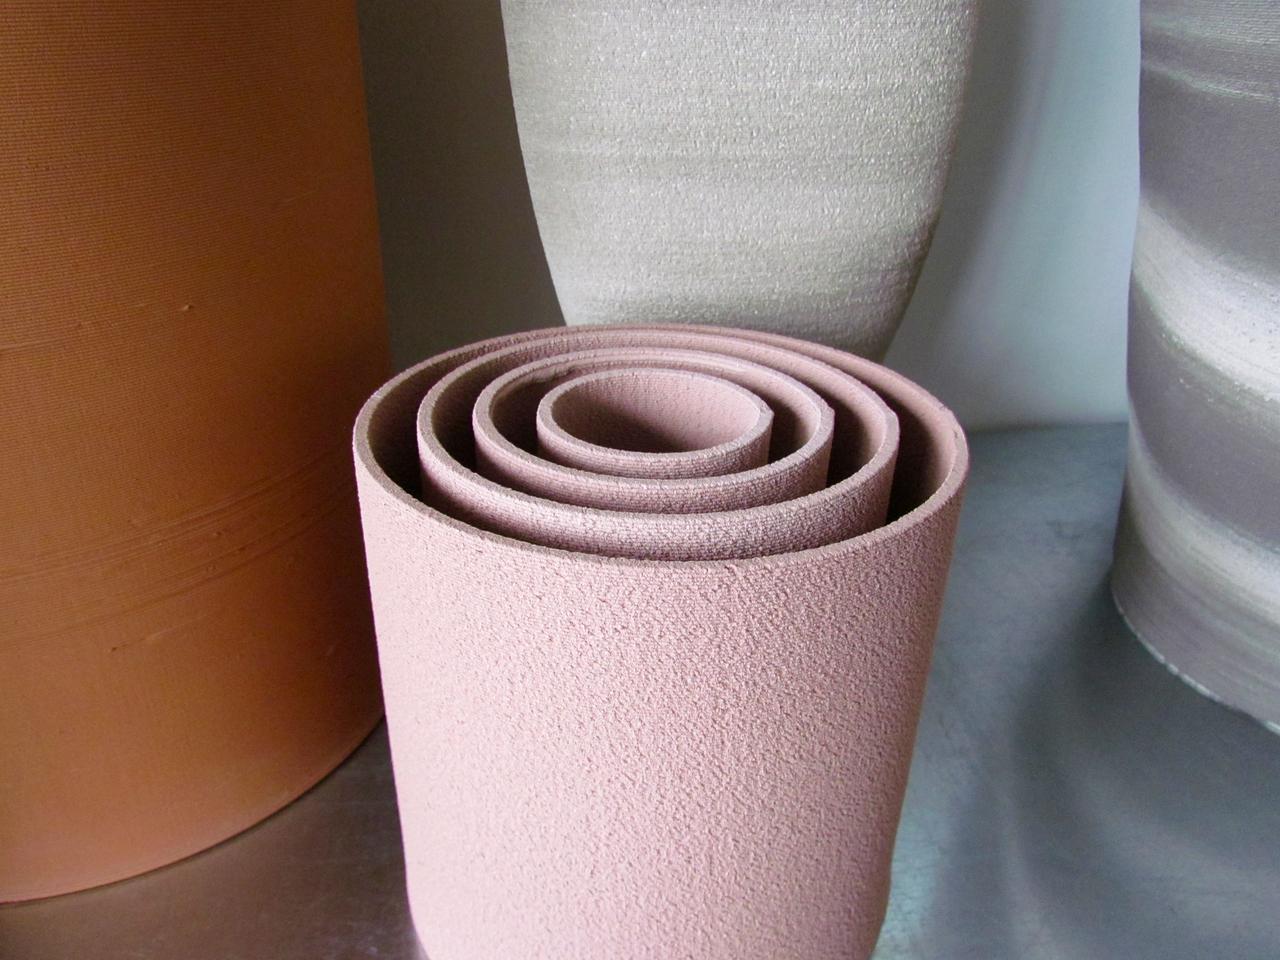 A selection of fine vases 3D printed in ceramics by Olivier van Herpt